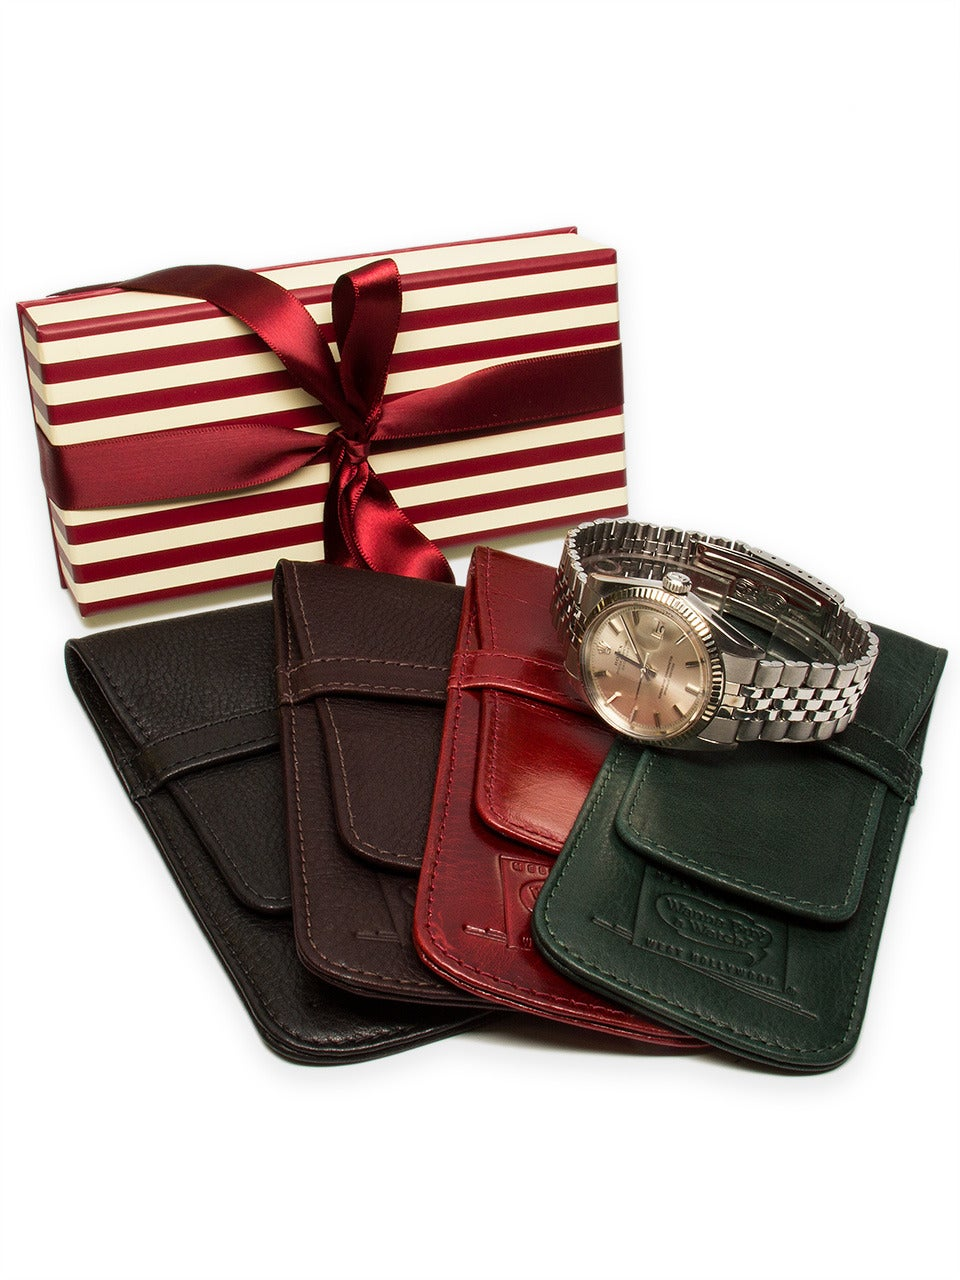 Patek Philippe Rose Gold Wristwatch Ref 3923 5